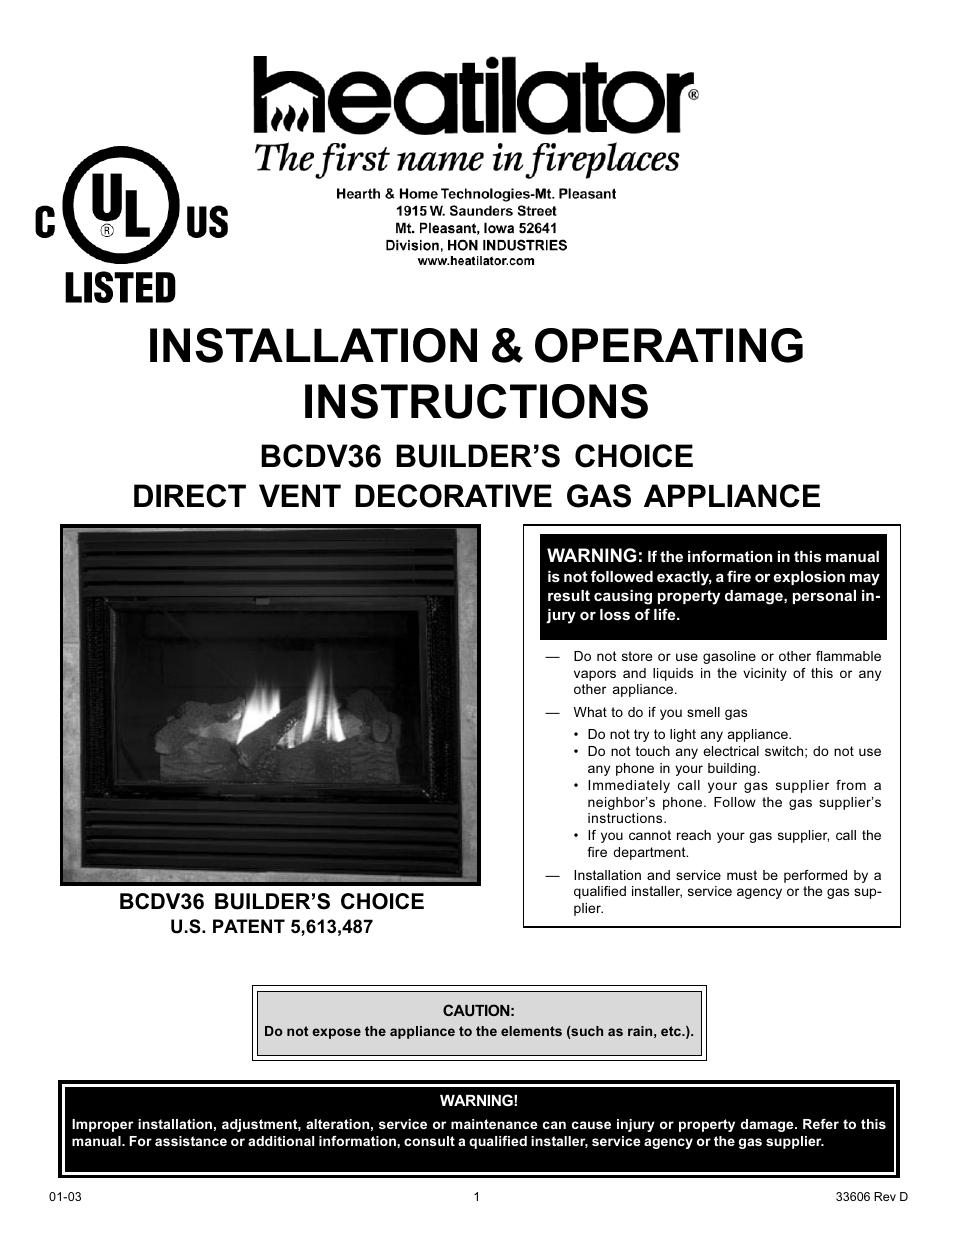 Heatiator Heatilator Bcdv36 User Manual